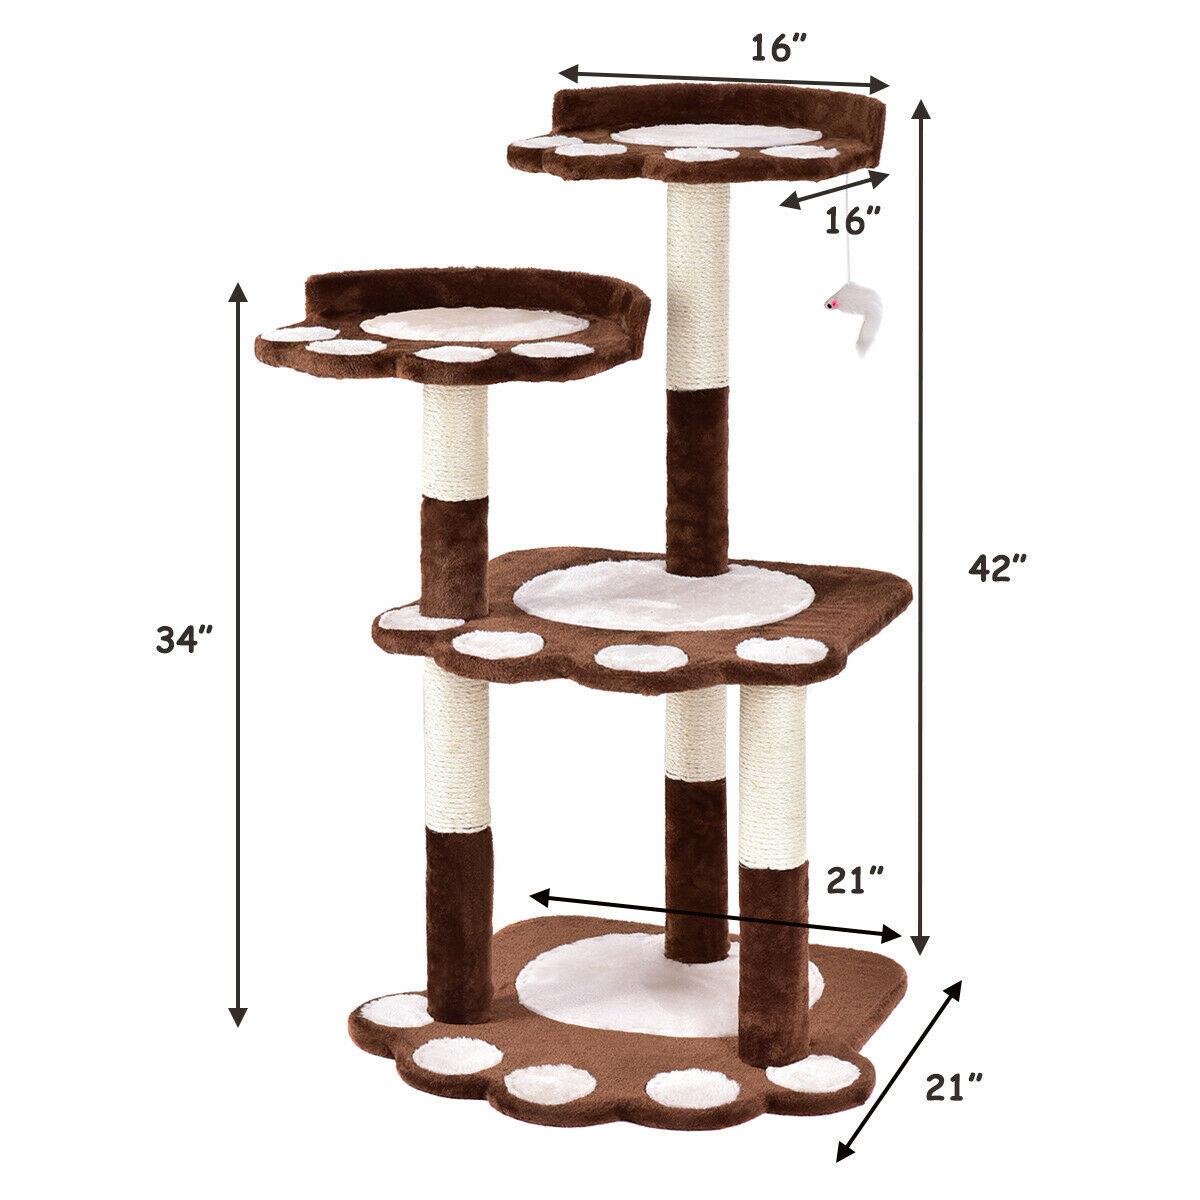 Gymax 42'' Cat Tree Kitten Pet Furniture Multi-level Climb Scratching Posts Paw Brown - image 9 de 10